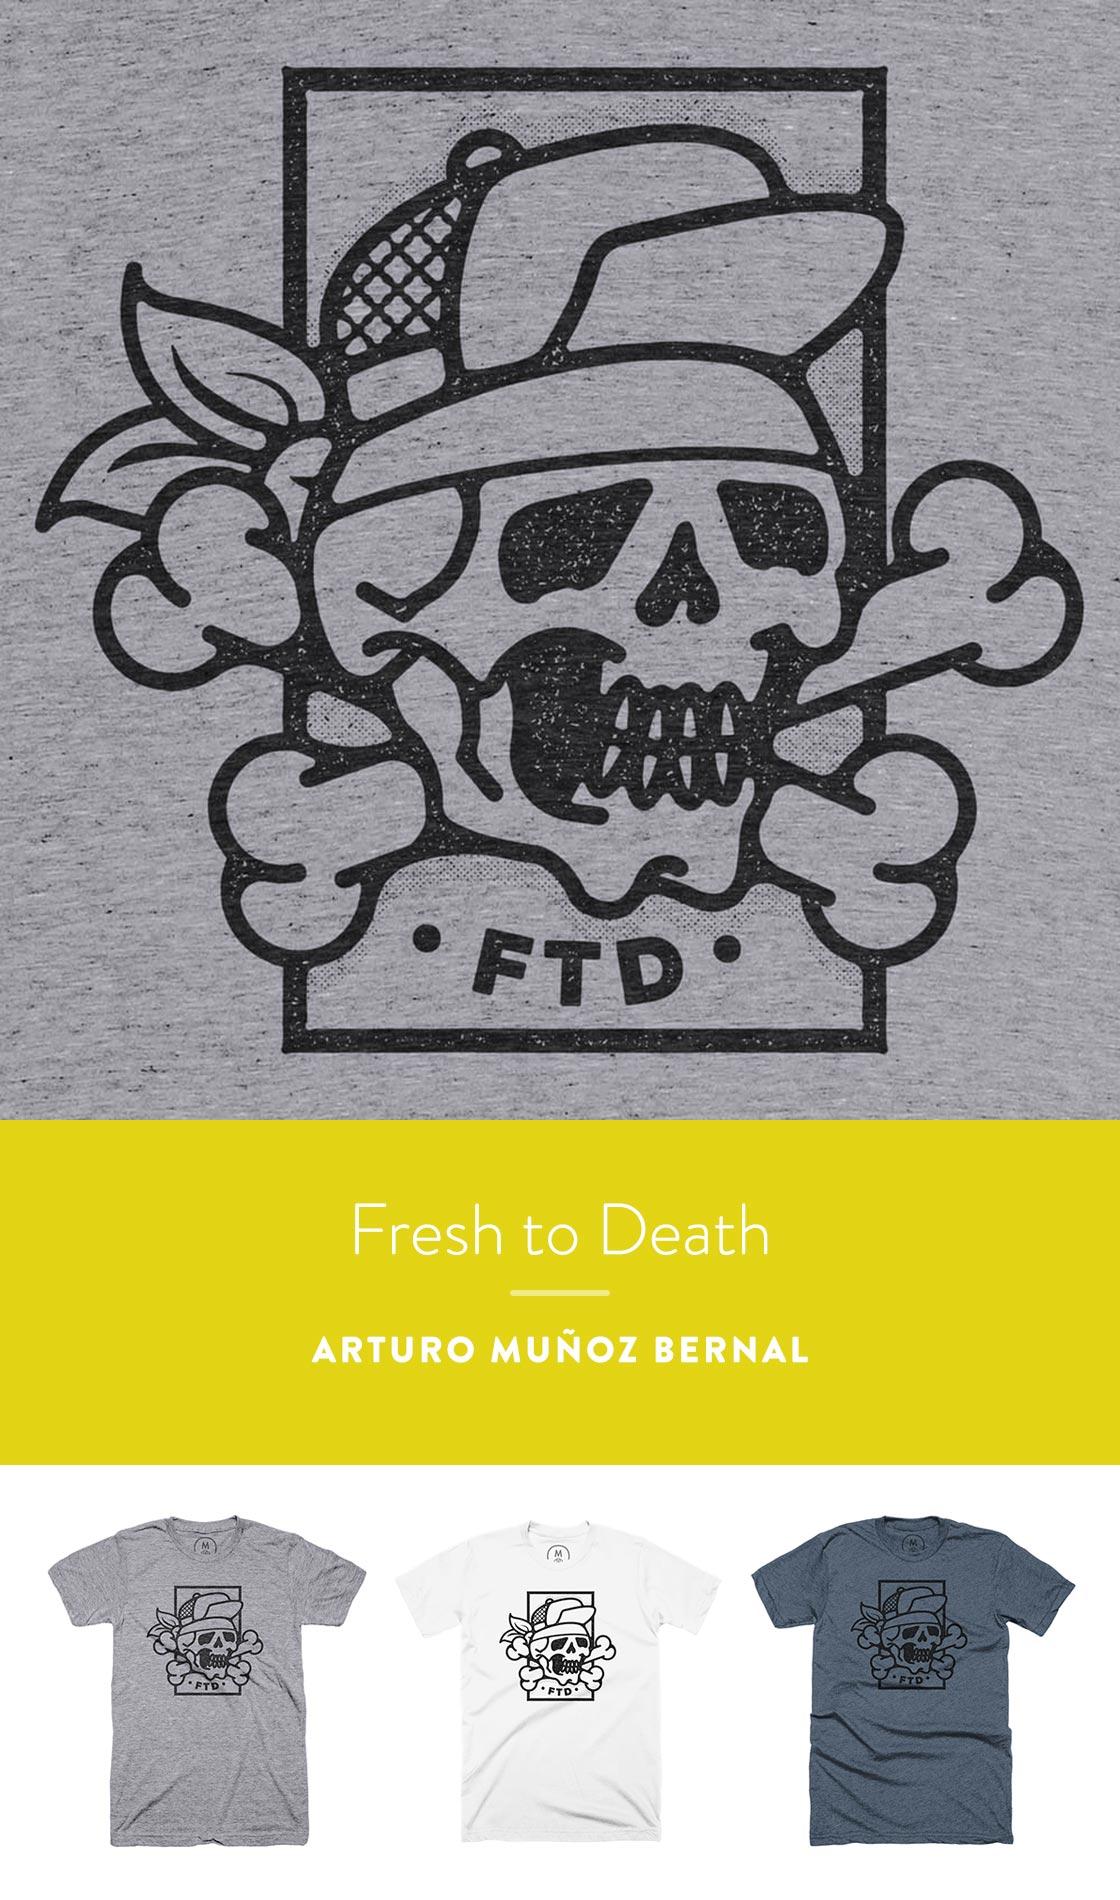 Fresh to Death by Arturo Muñoz Bernal